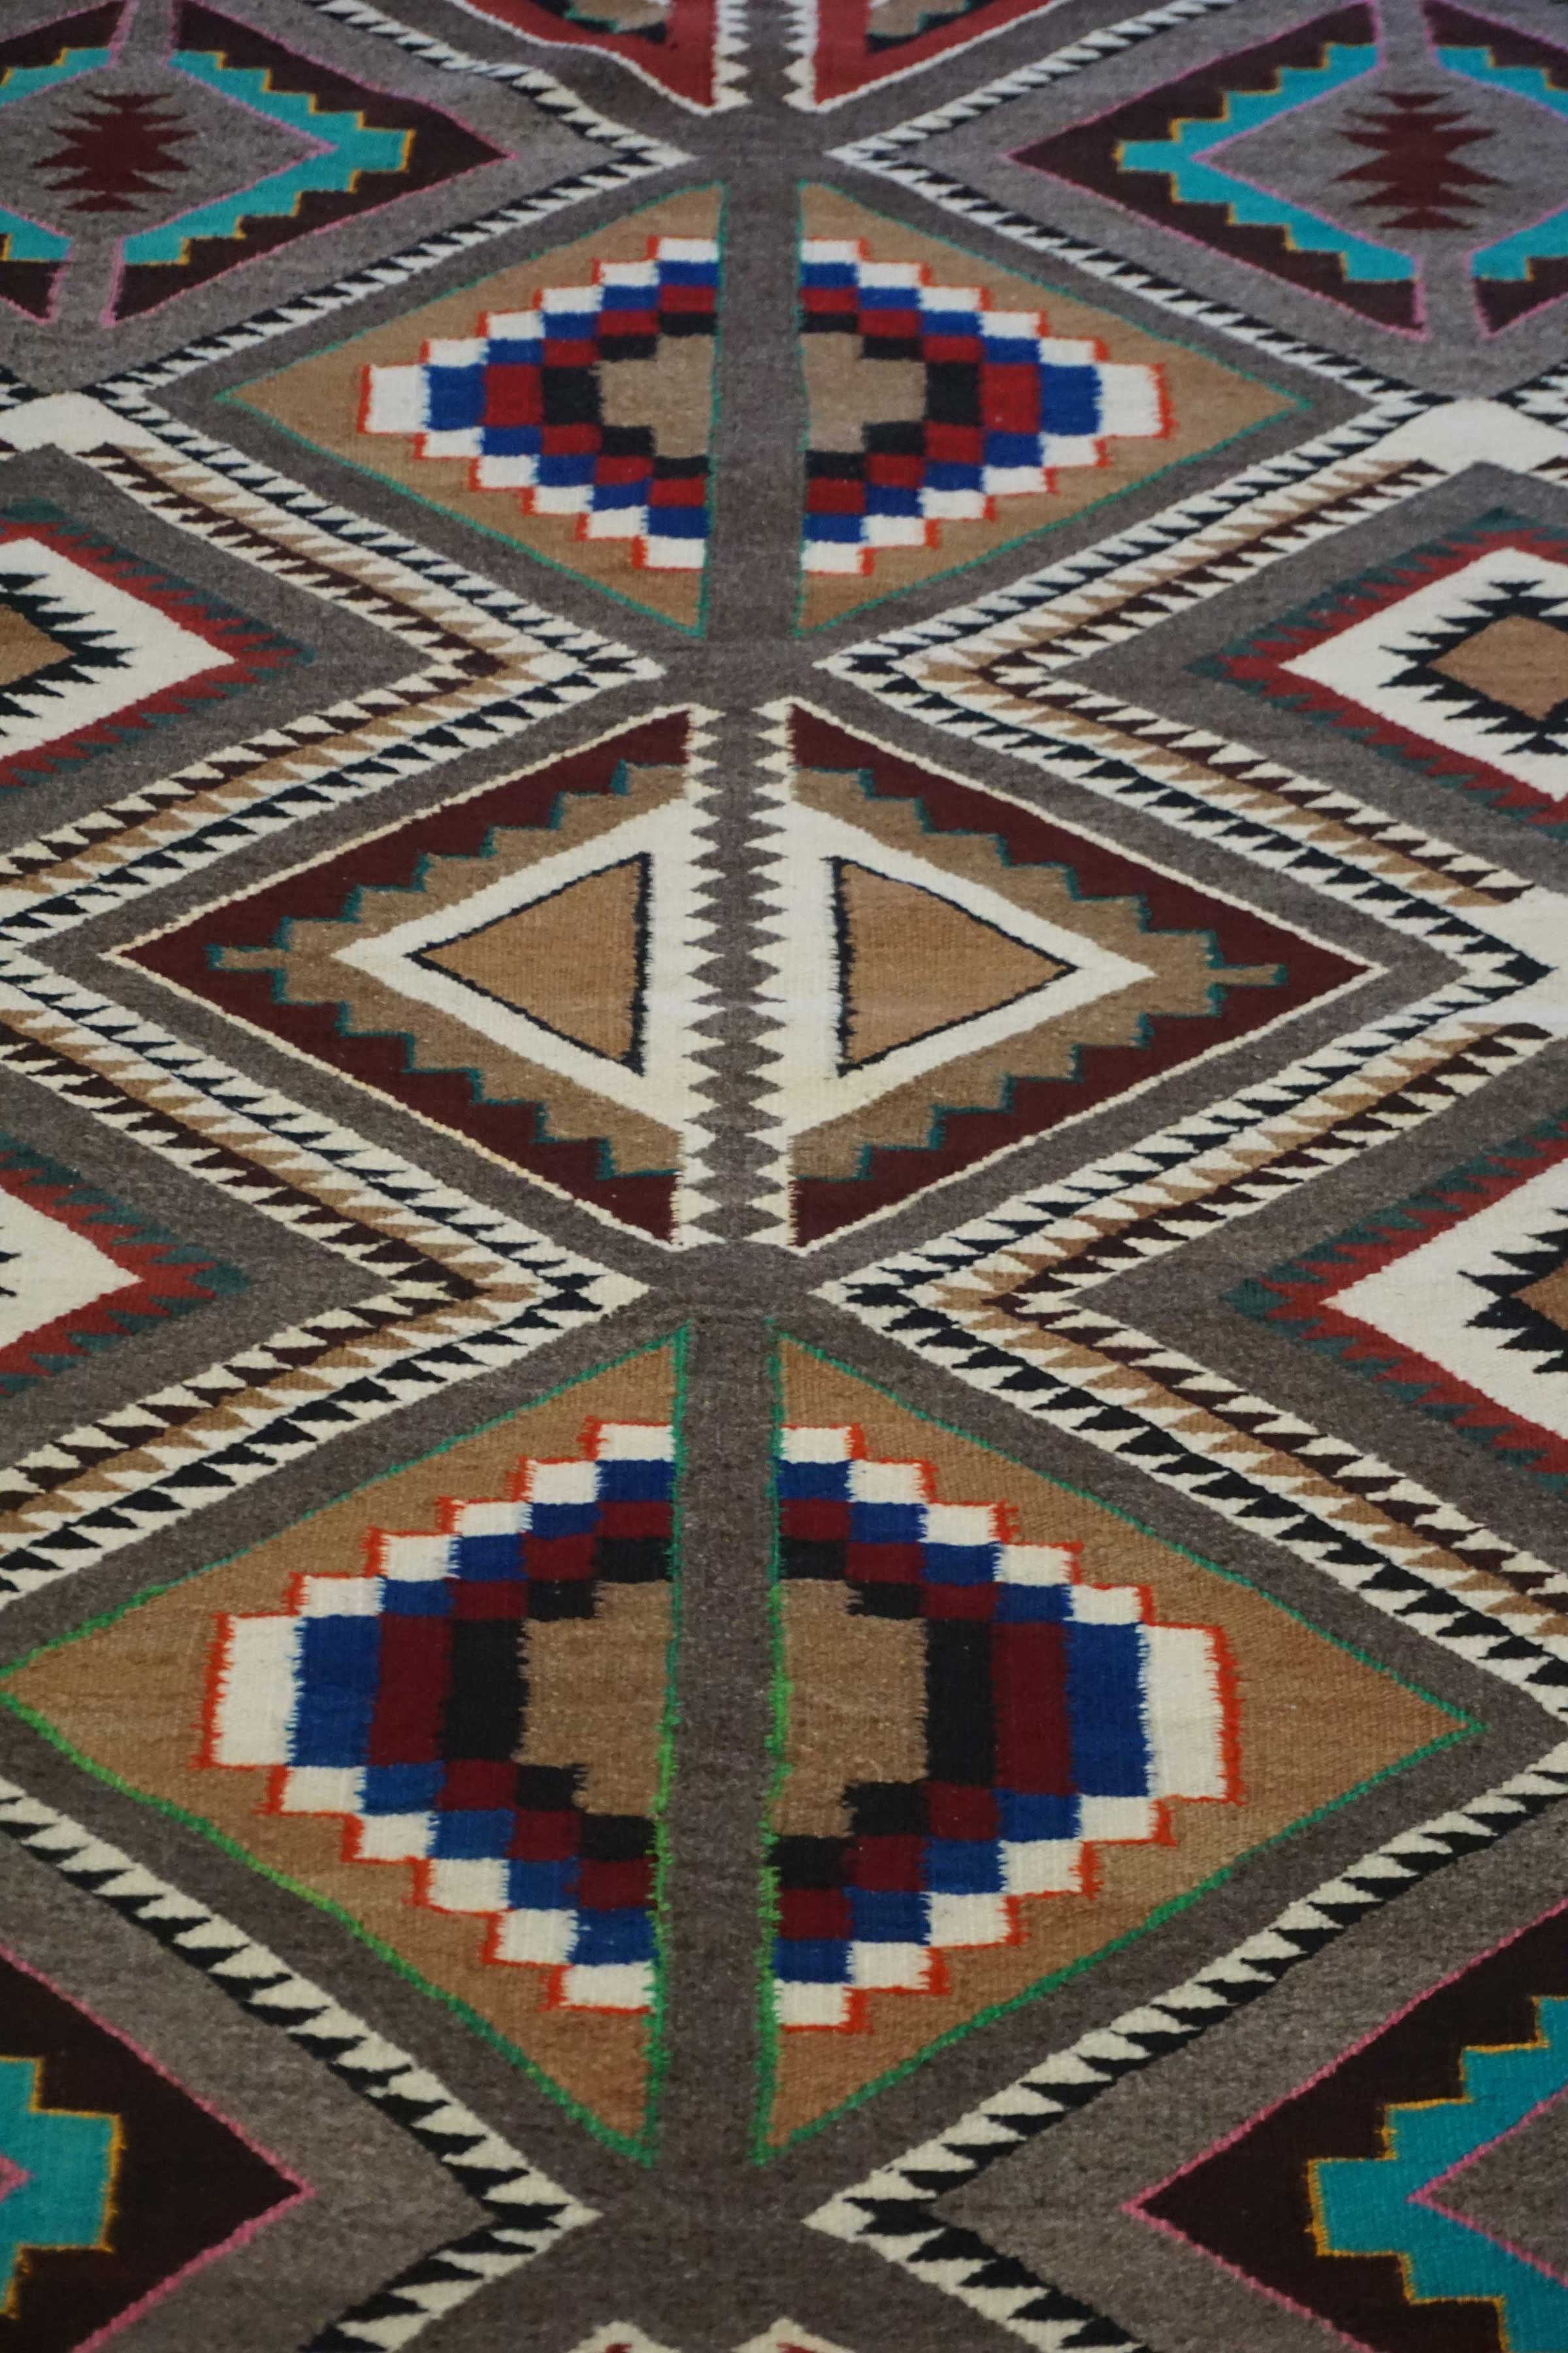 Teec Nos Pos Navajo Rug 1069 Charley S Navajo Rugs For Sale